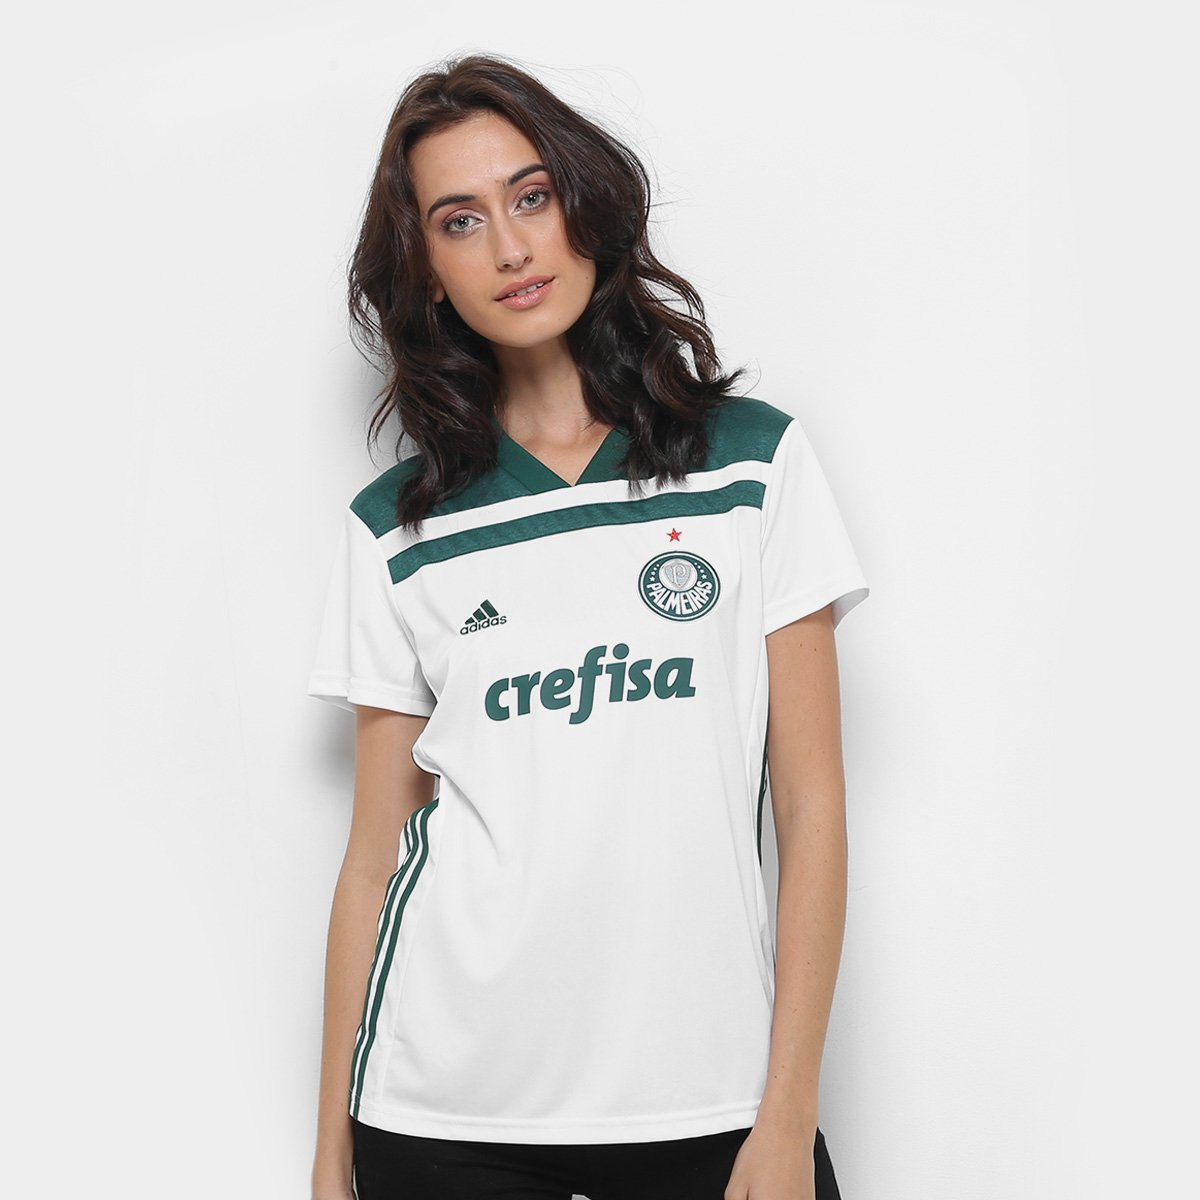 Feminina Camisa Palmeiras Verde e II s n° Torcedor 2018 Branco Adidas  0ggrPnFd 5845cce9f2a78